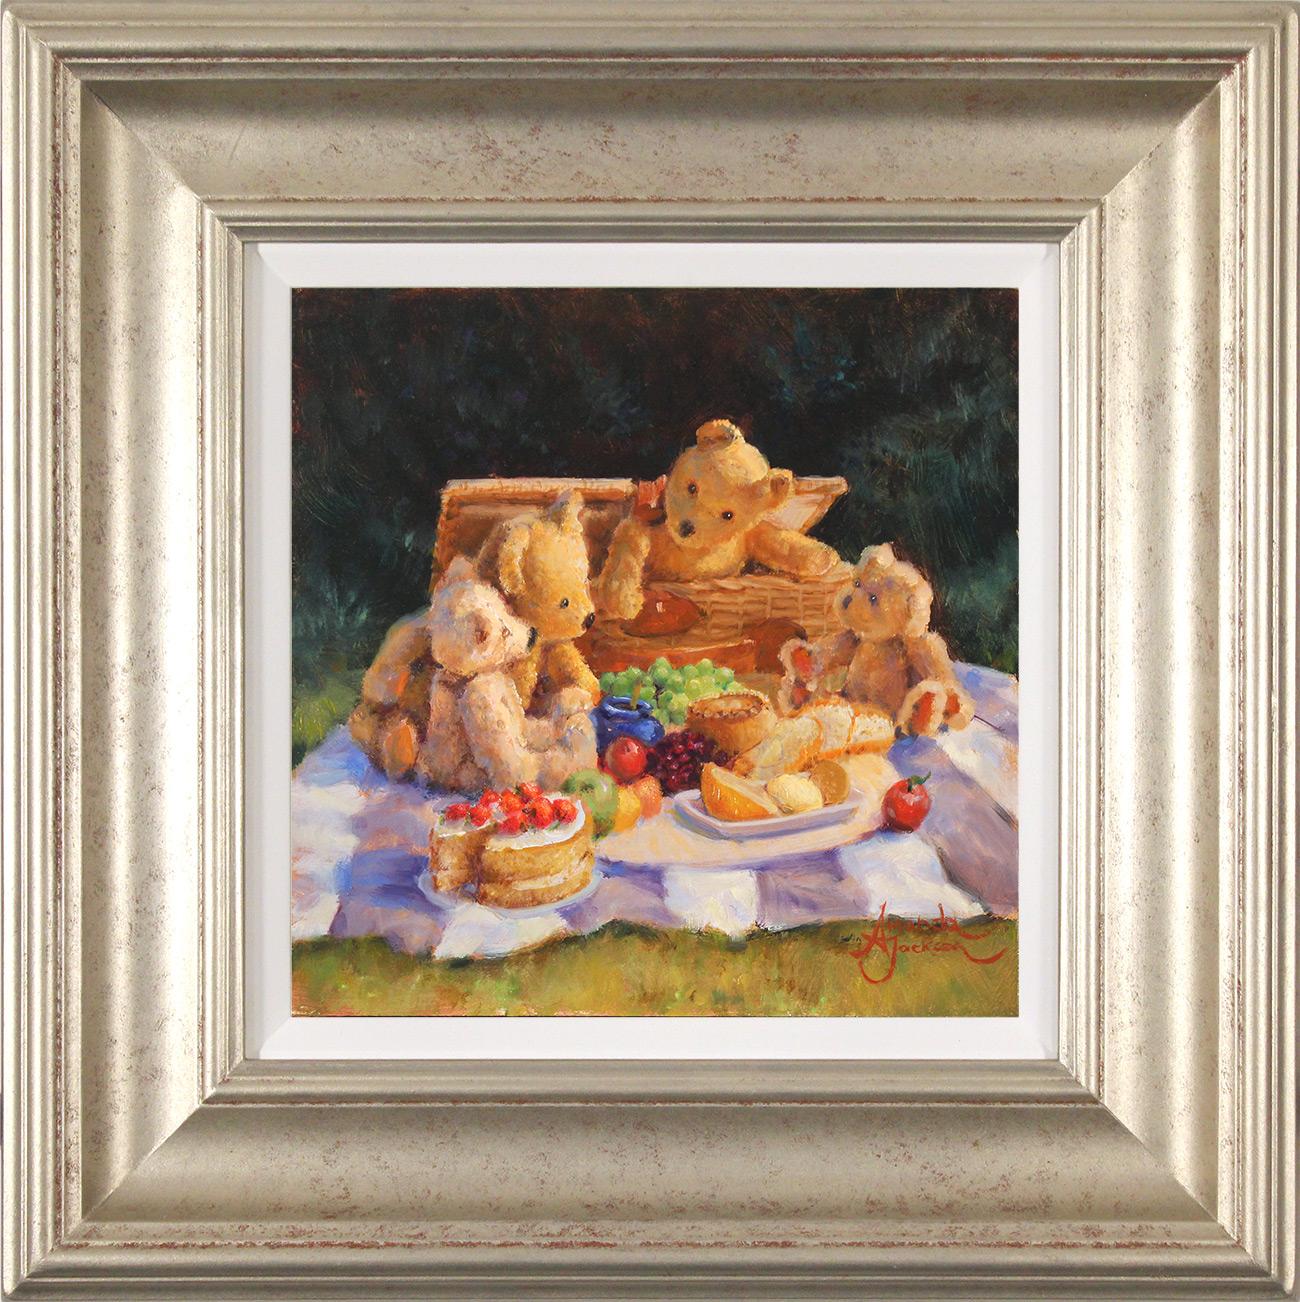 Amanda Jackson, Original oil painting on panel, Teddy Bear's  Picnic, click to enlarge